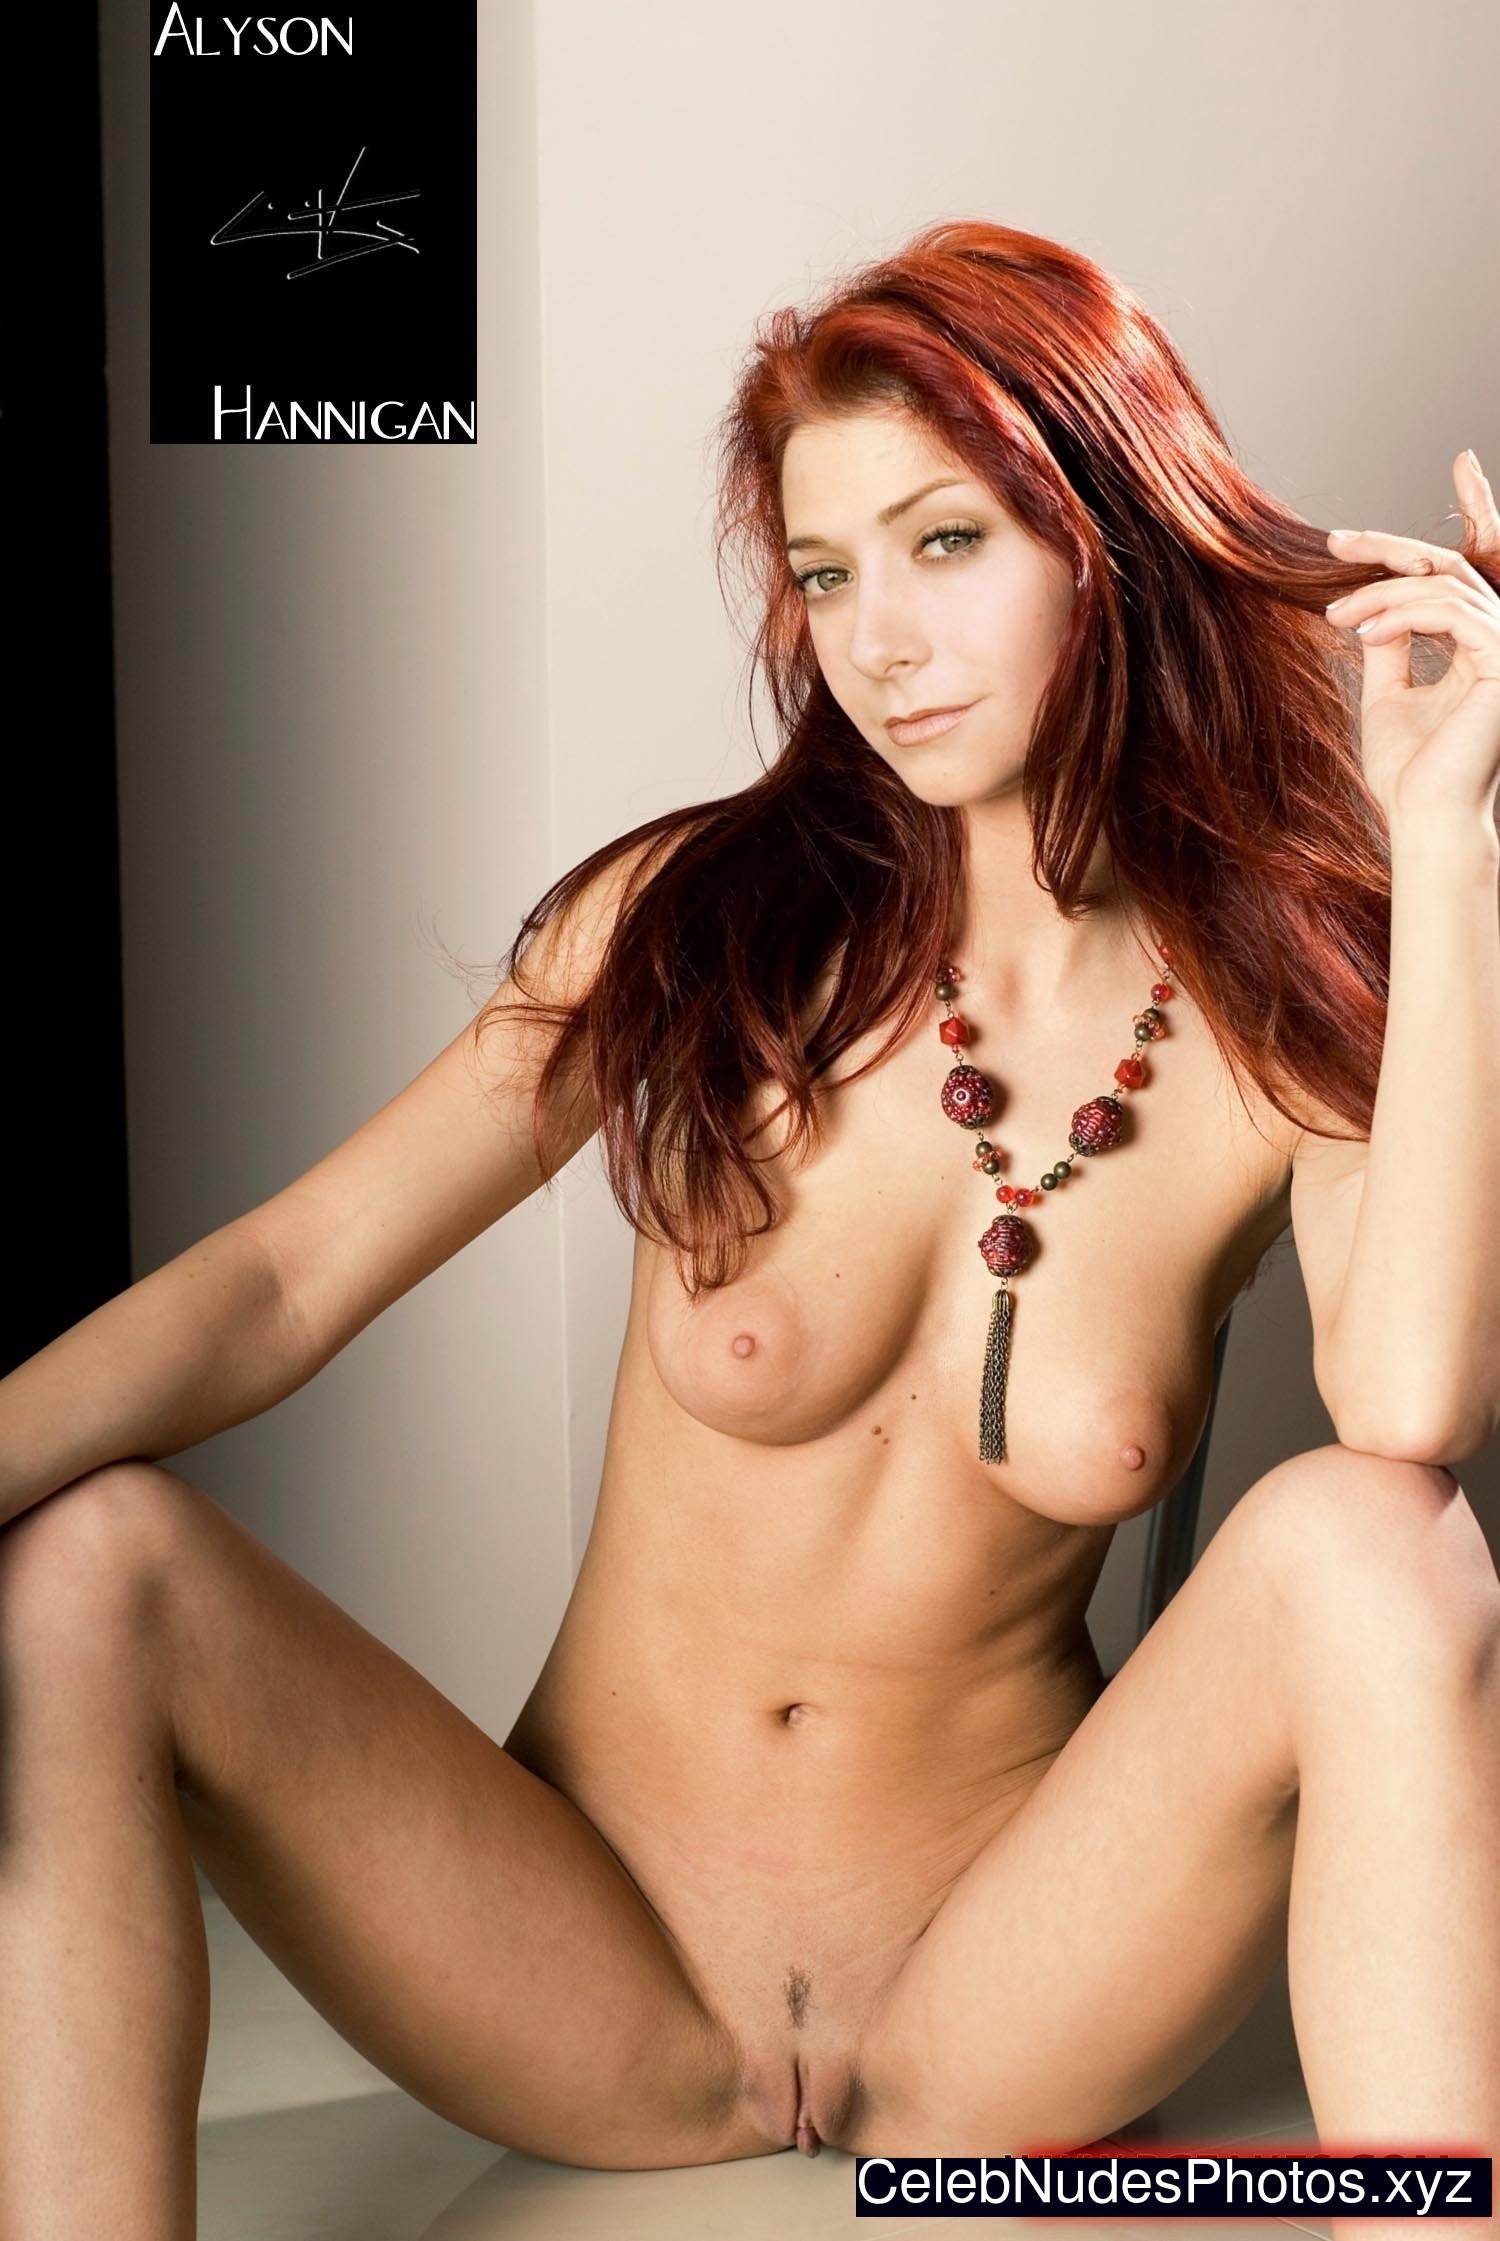 alyson hannigan sexy topless